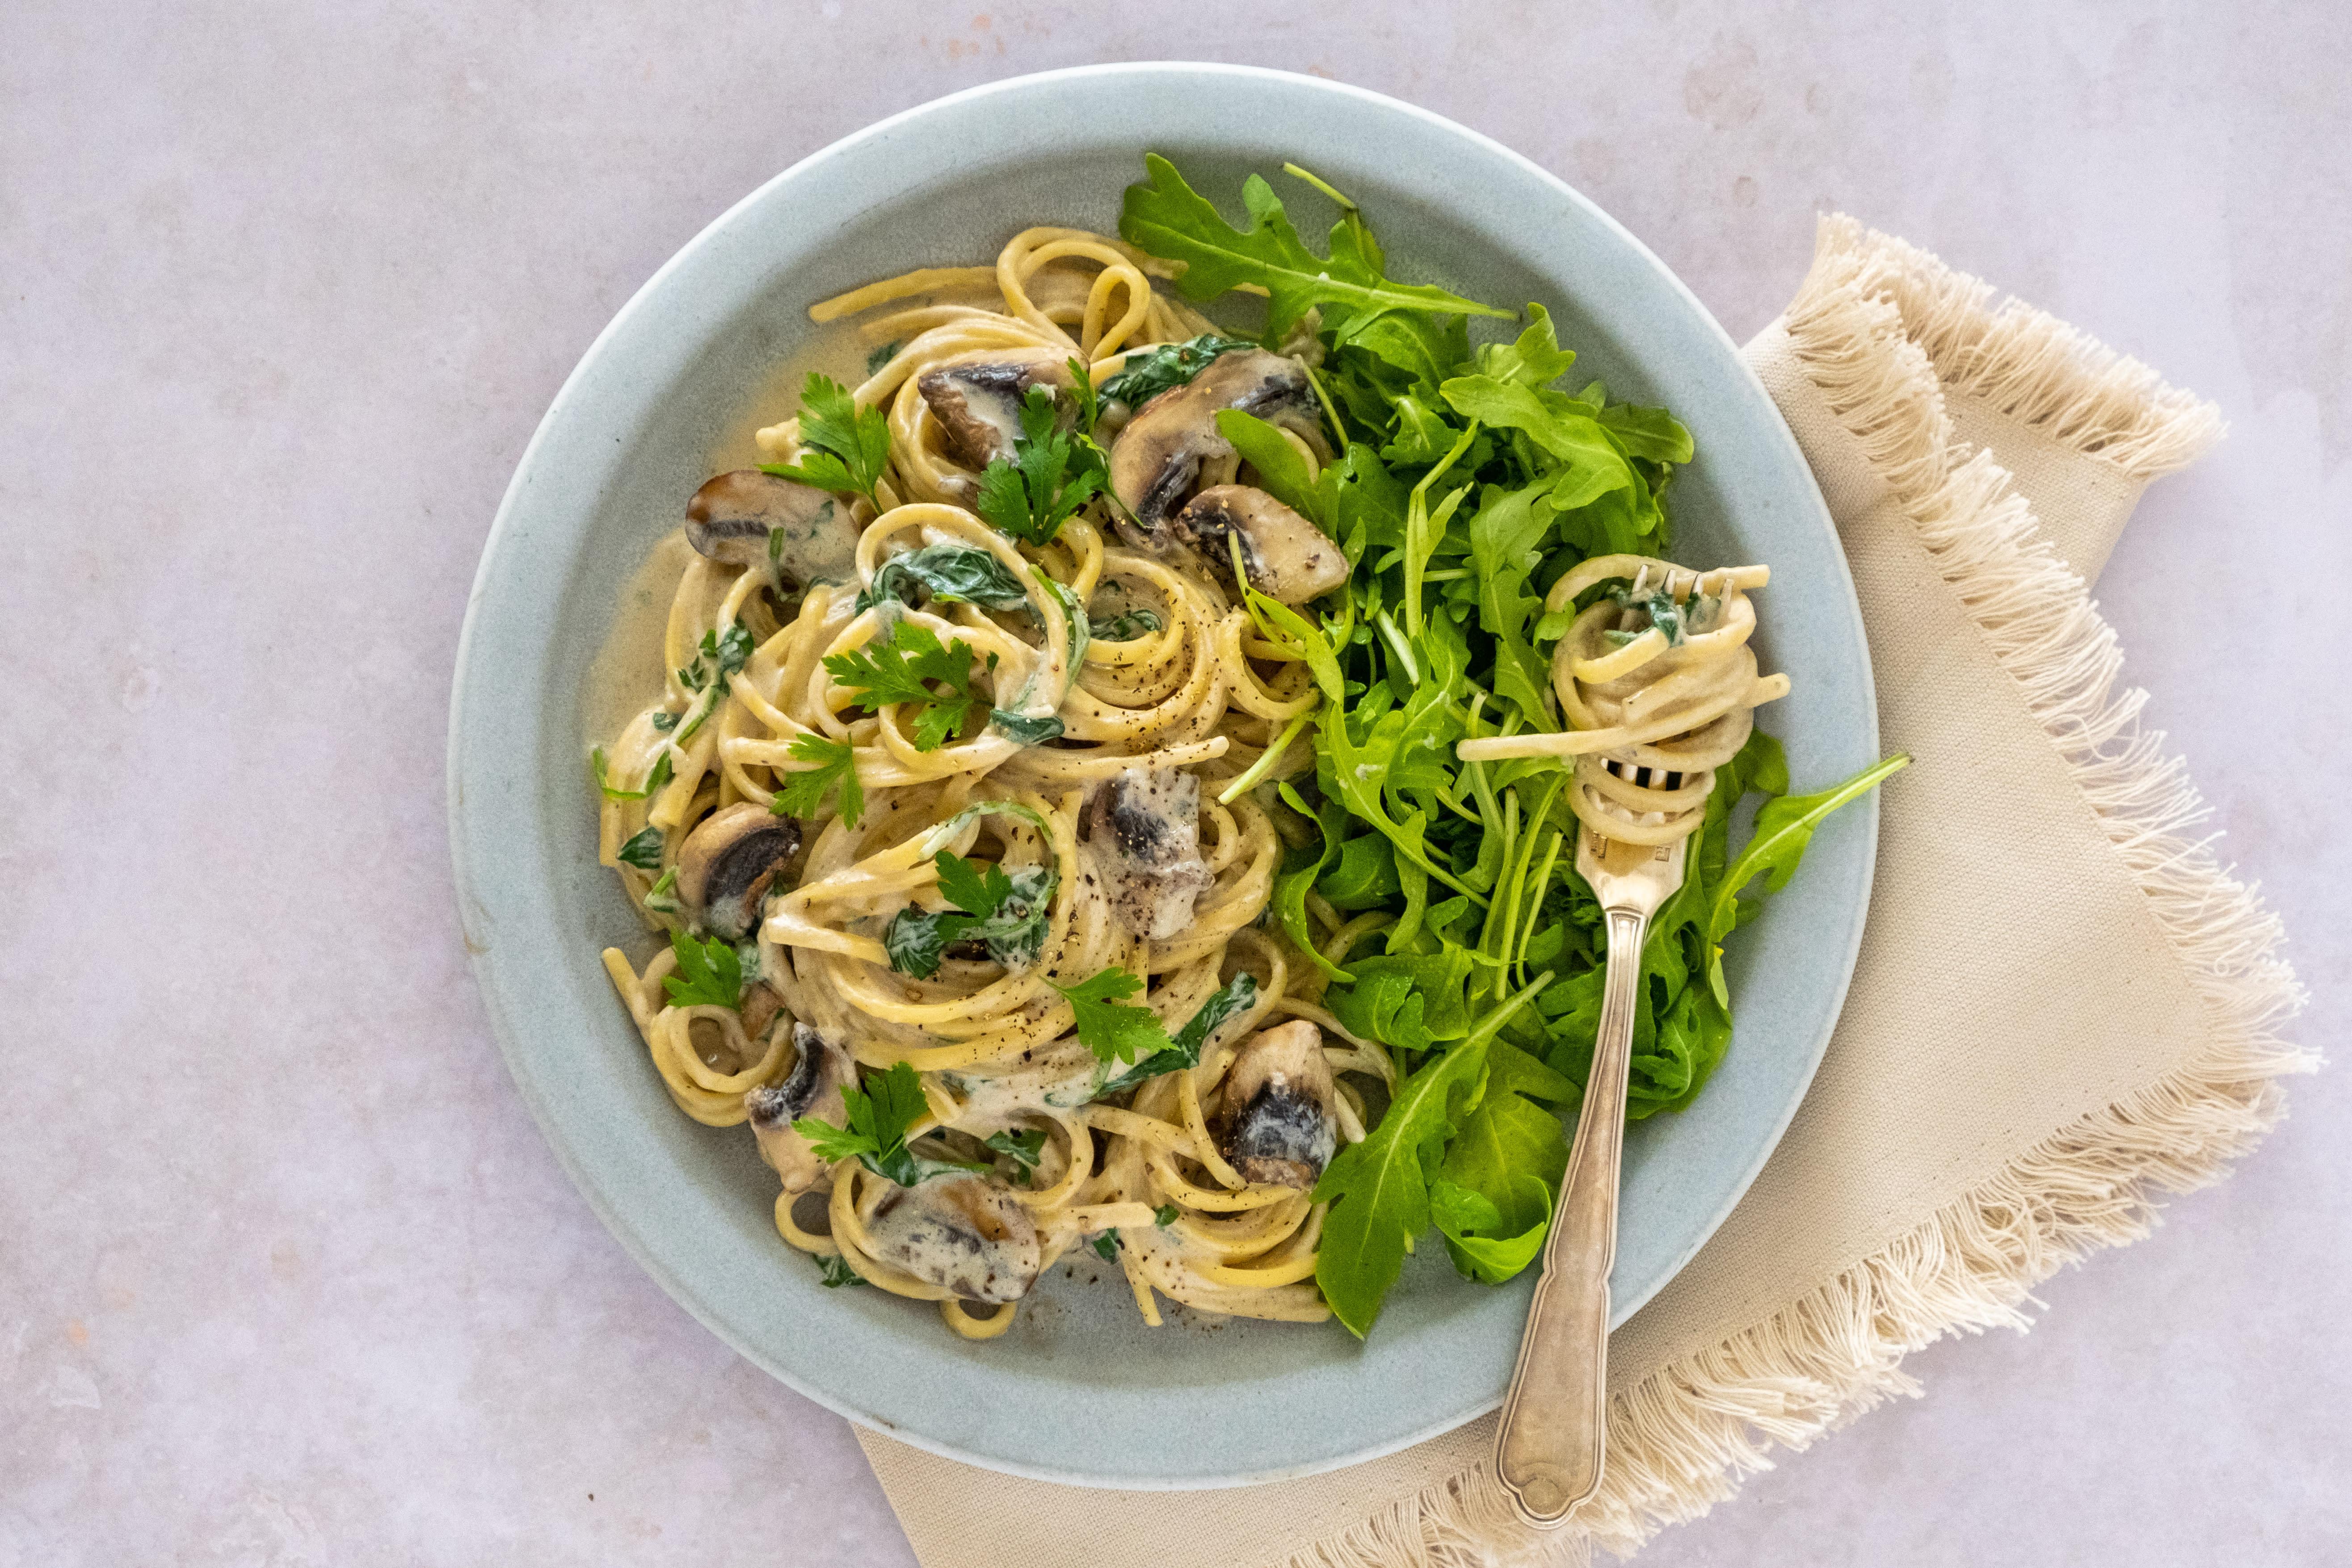 Truffle and Mushroom Linguine with Rocket Salad